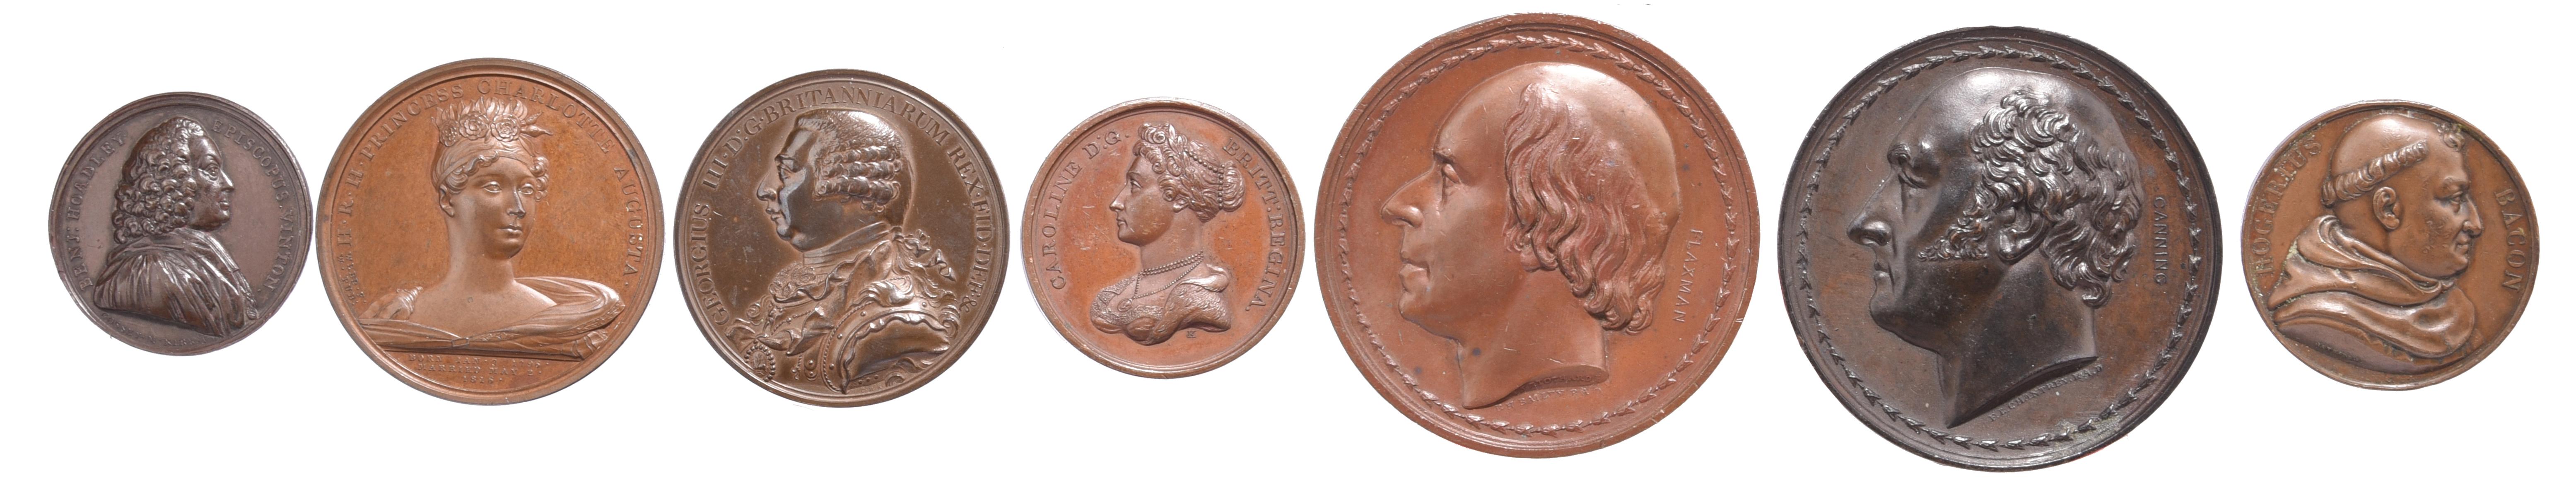 Seven various historical medals: Death of Benjamin Hoadley 1761, AE, 37mm, bust right, rev. mitre